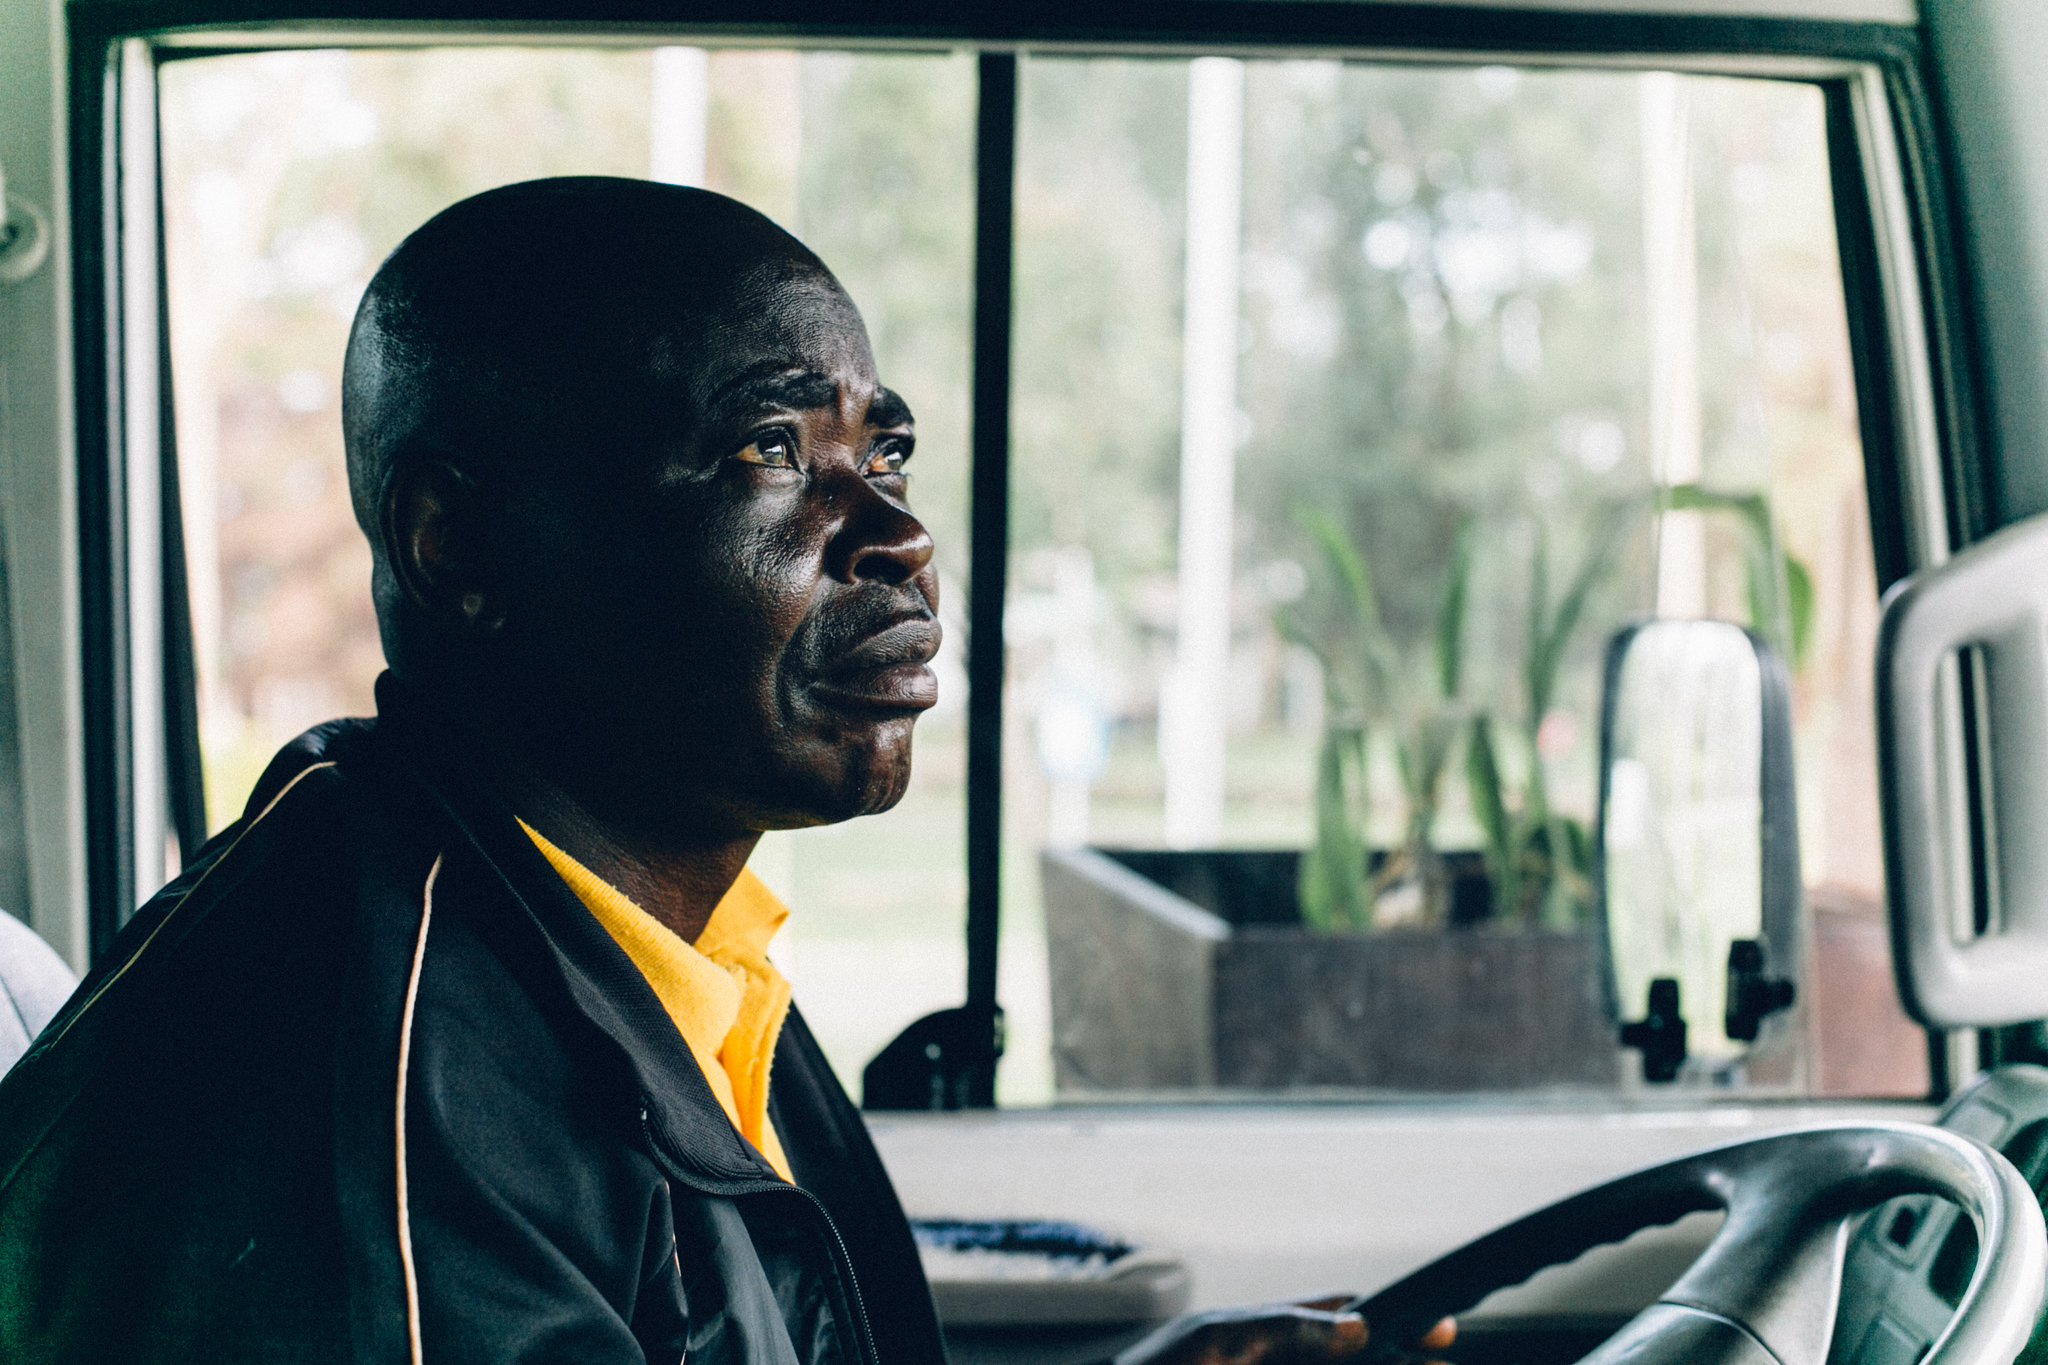 Tour bus driver, Obudu